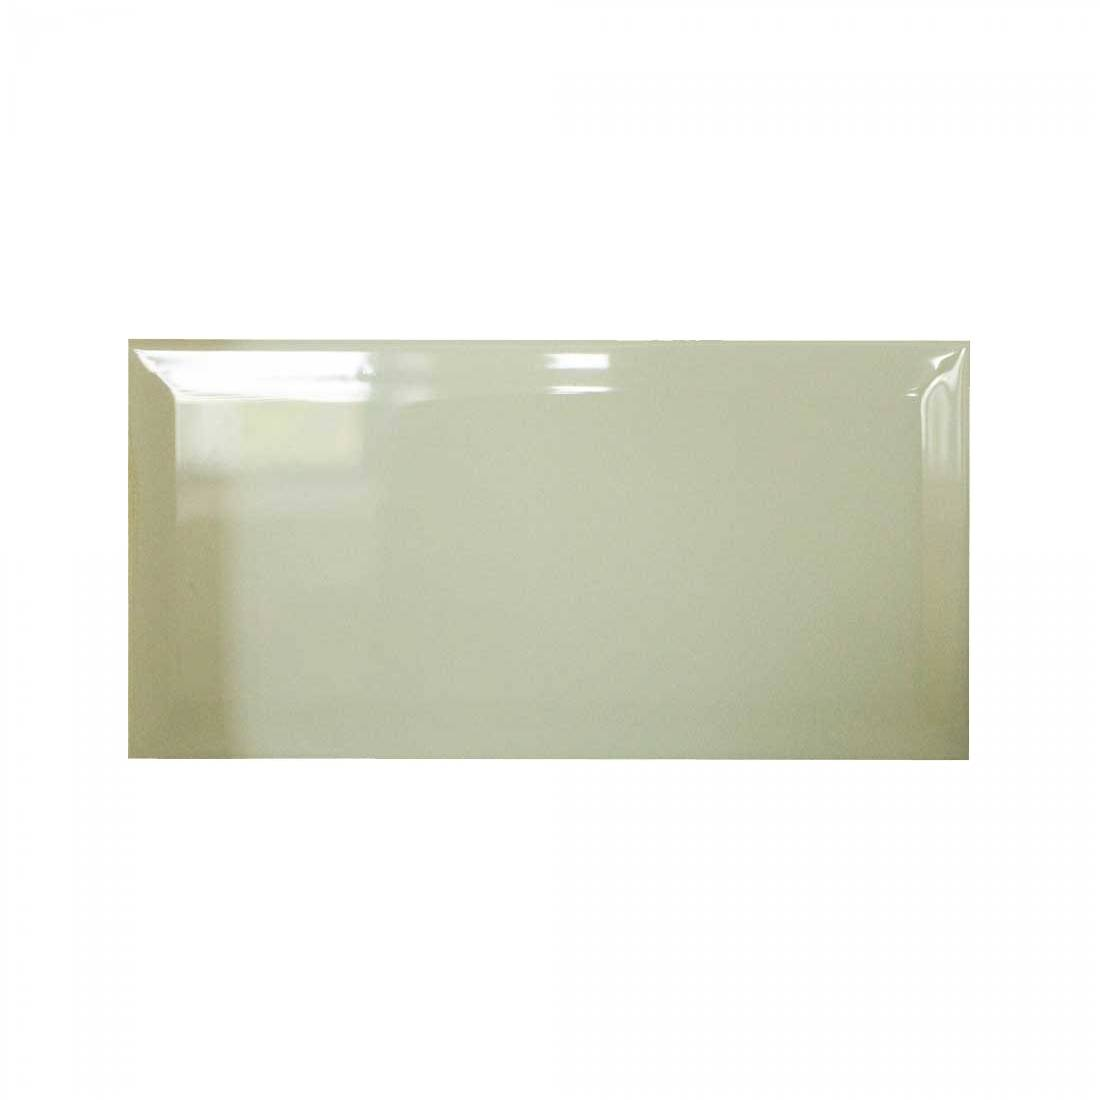 Biselado 10x20 Cream Gloss 1